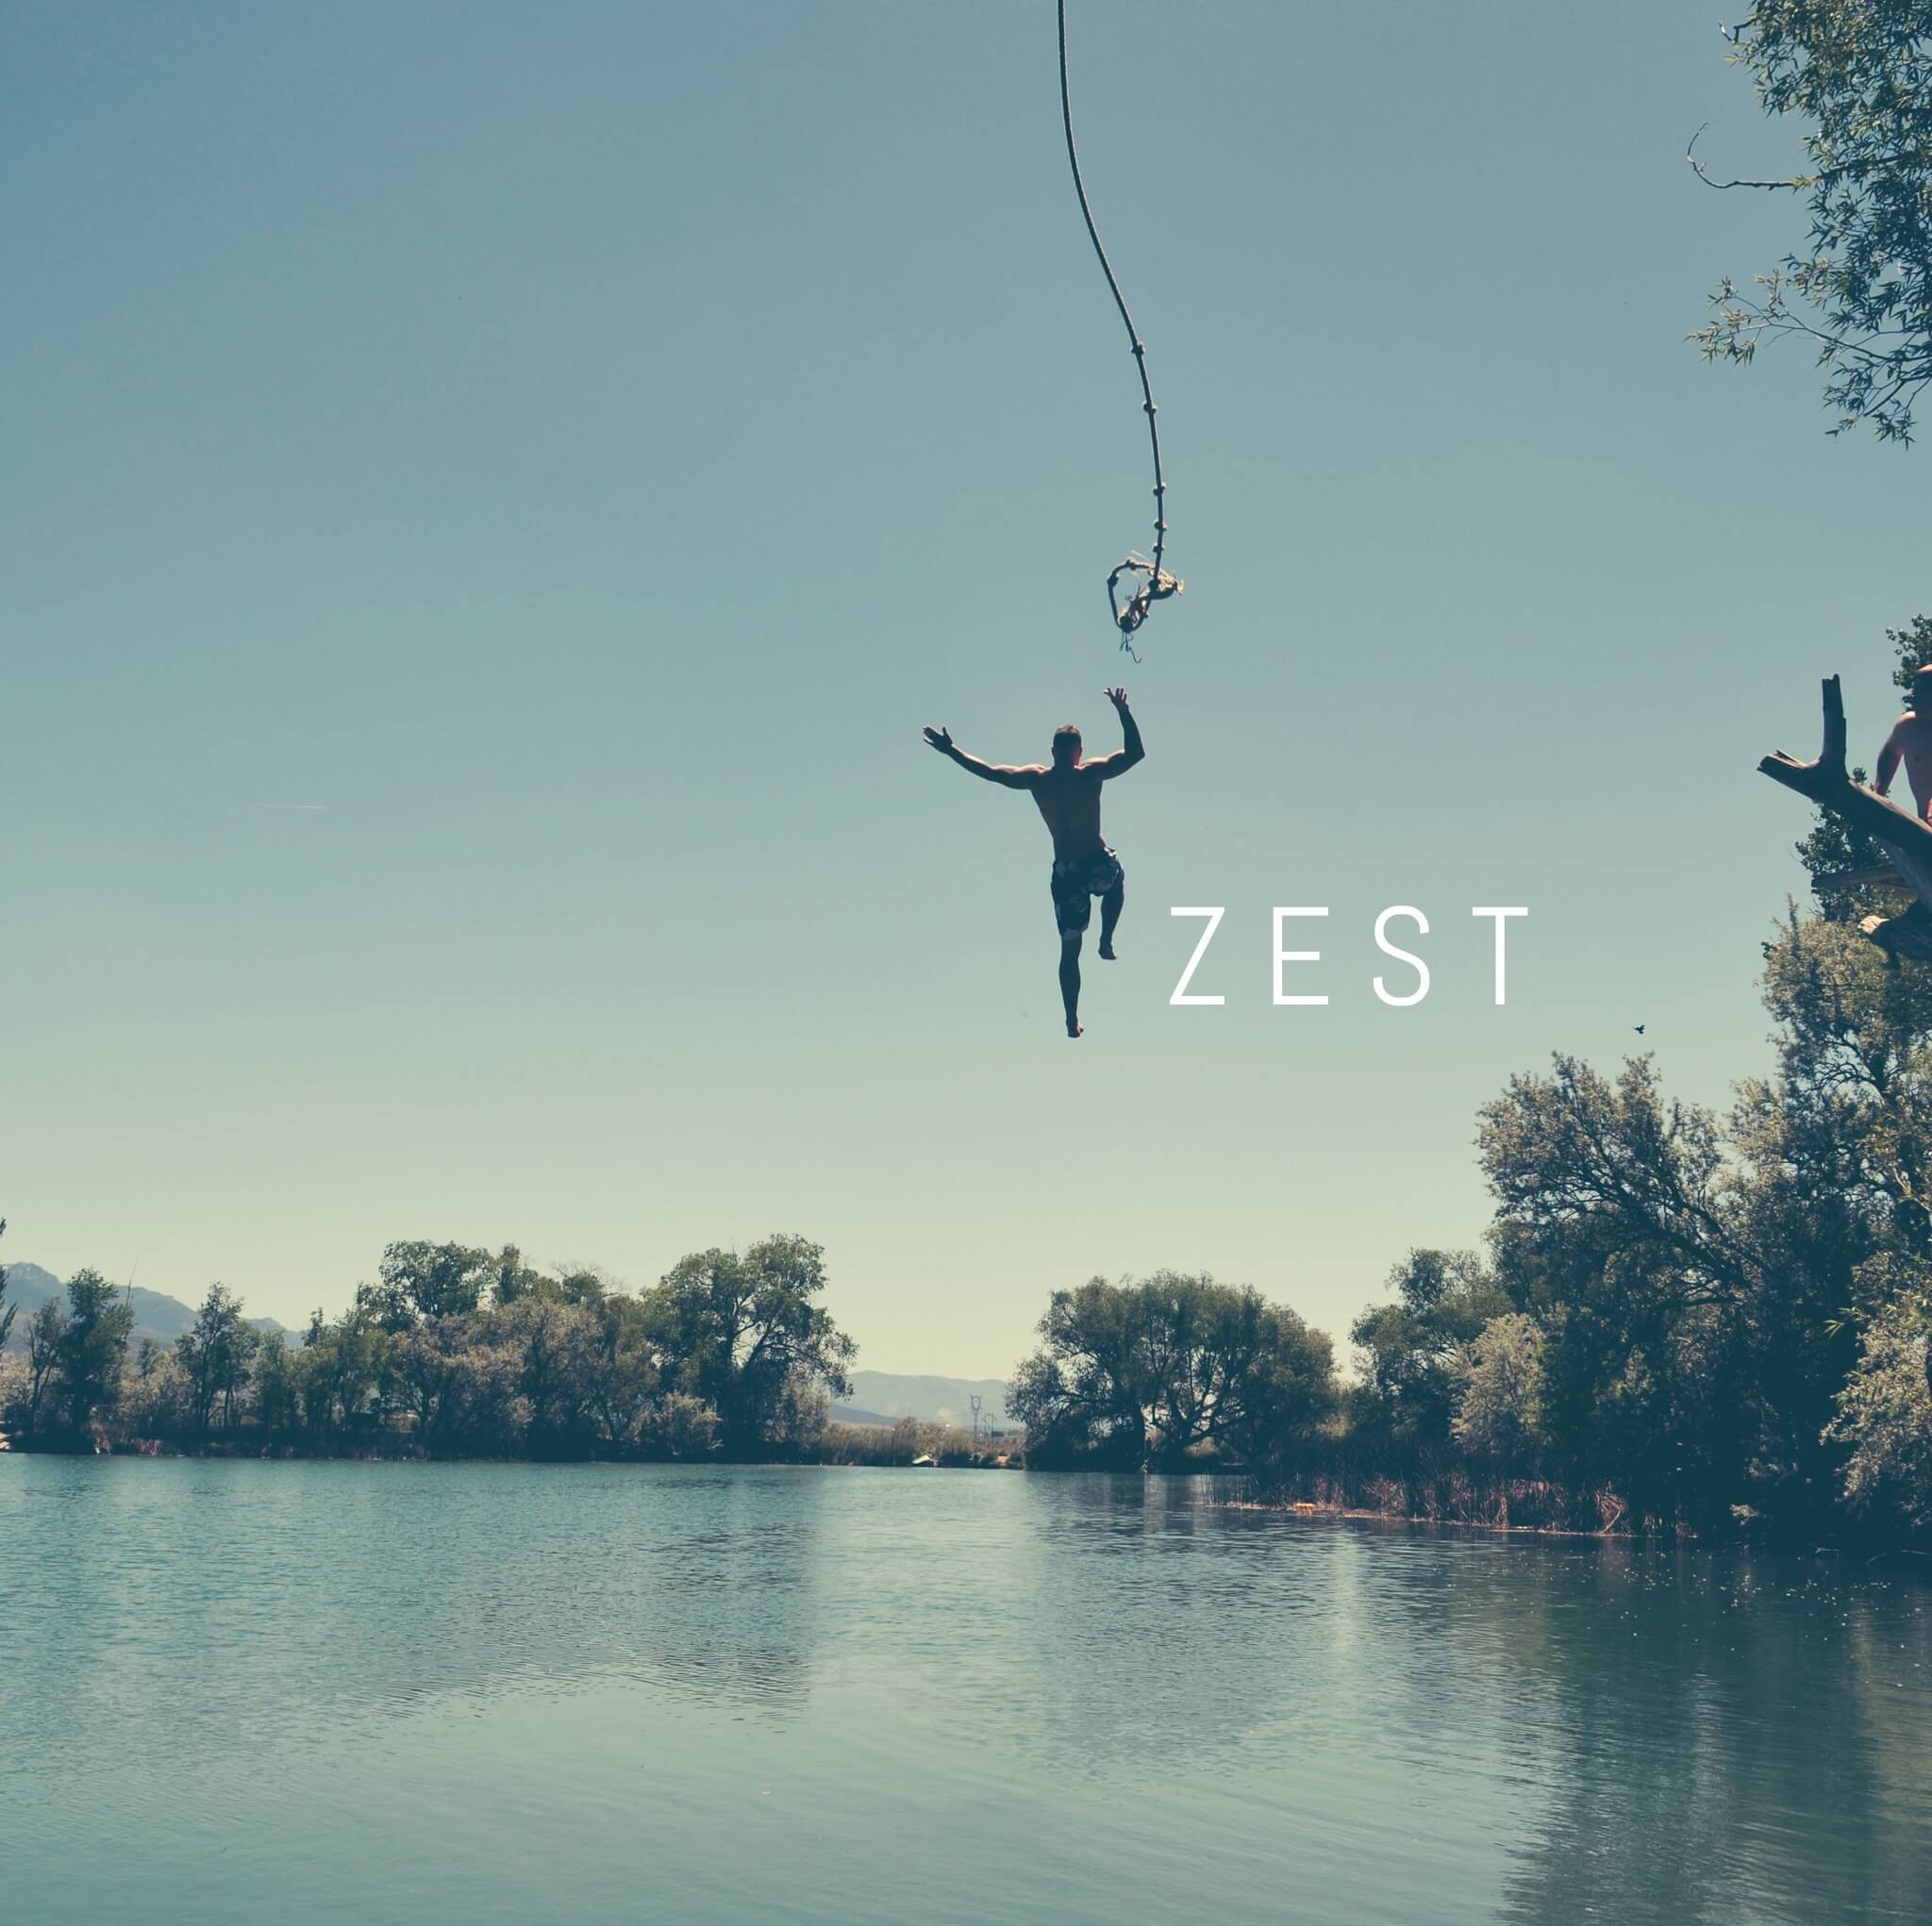 Zest | Strength | Signature Courage